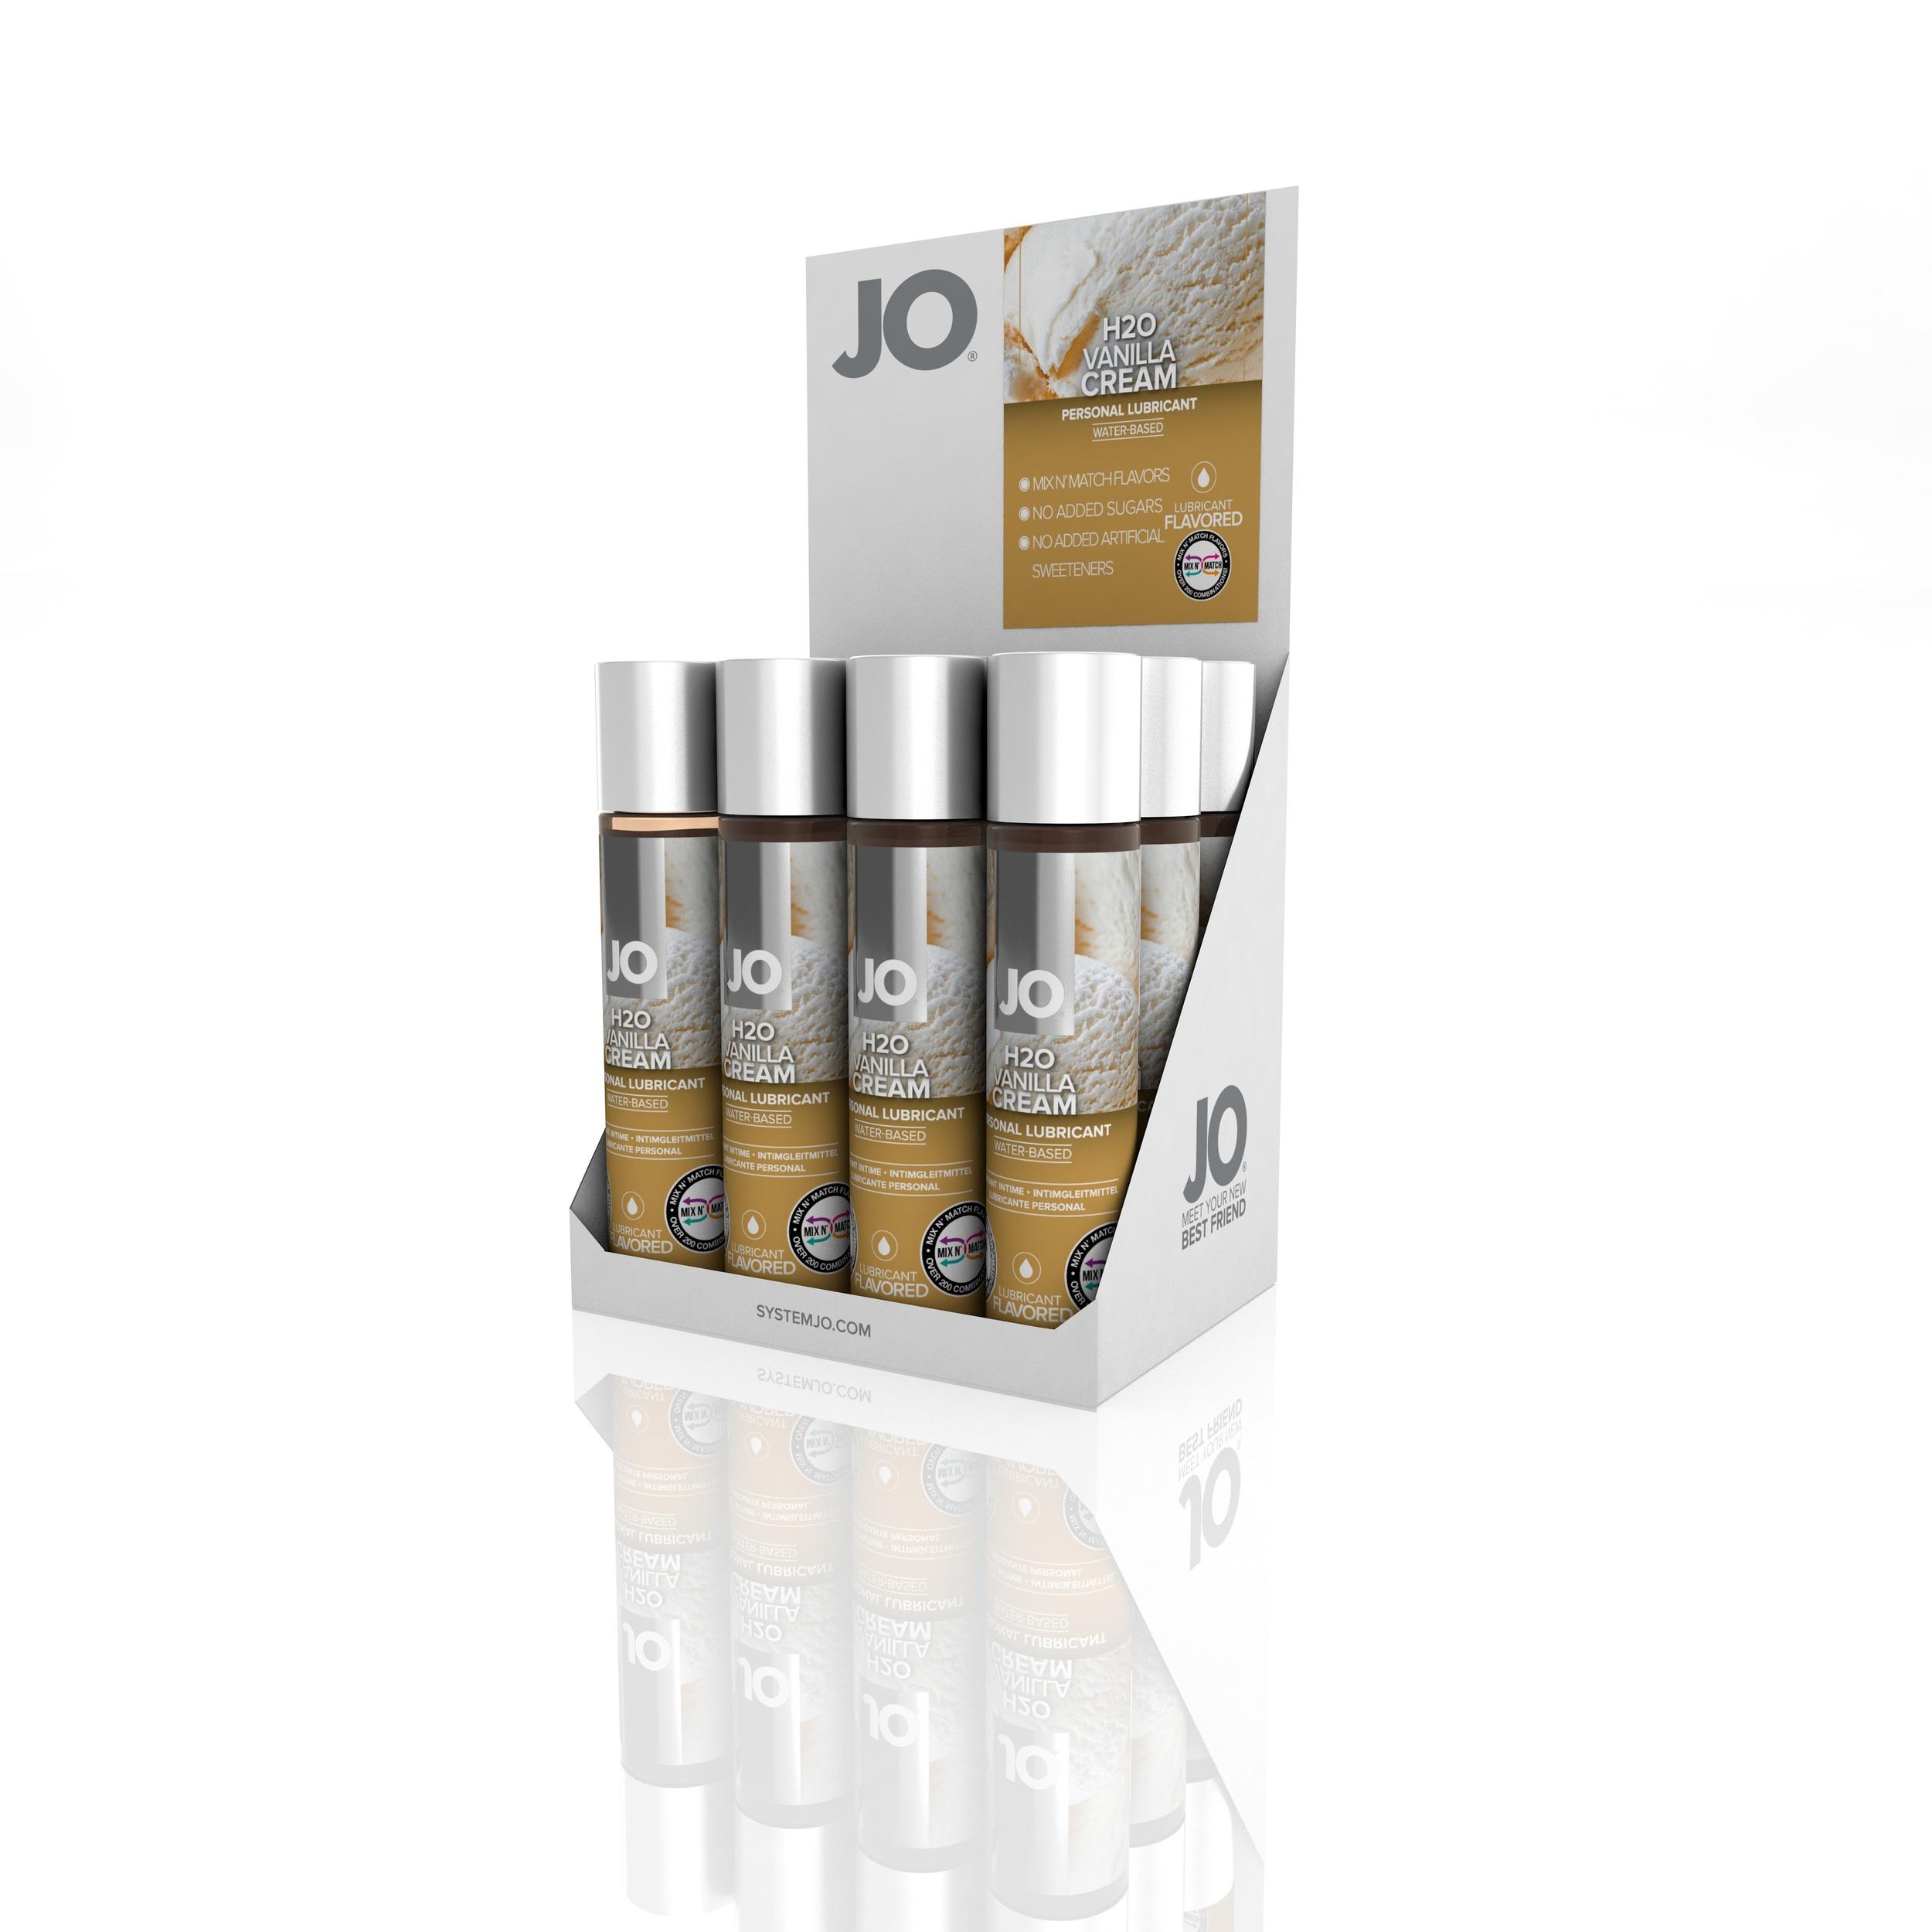 10384 - JO H2O FLAVORED LUBRICANT - VANILLA - 1fl.oz 30mL (MOQ 12 units - Includes Counter Display).jpg